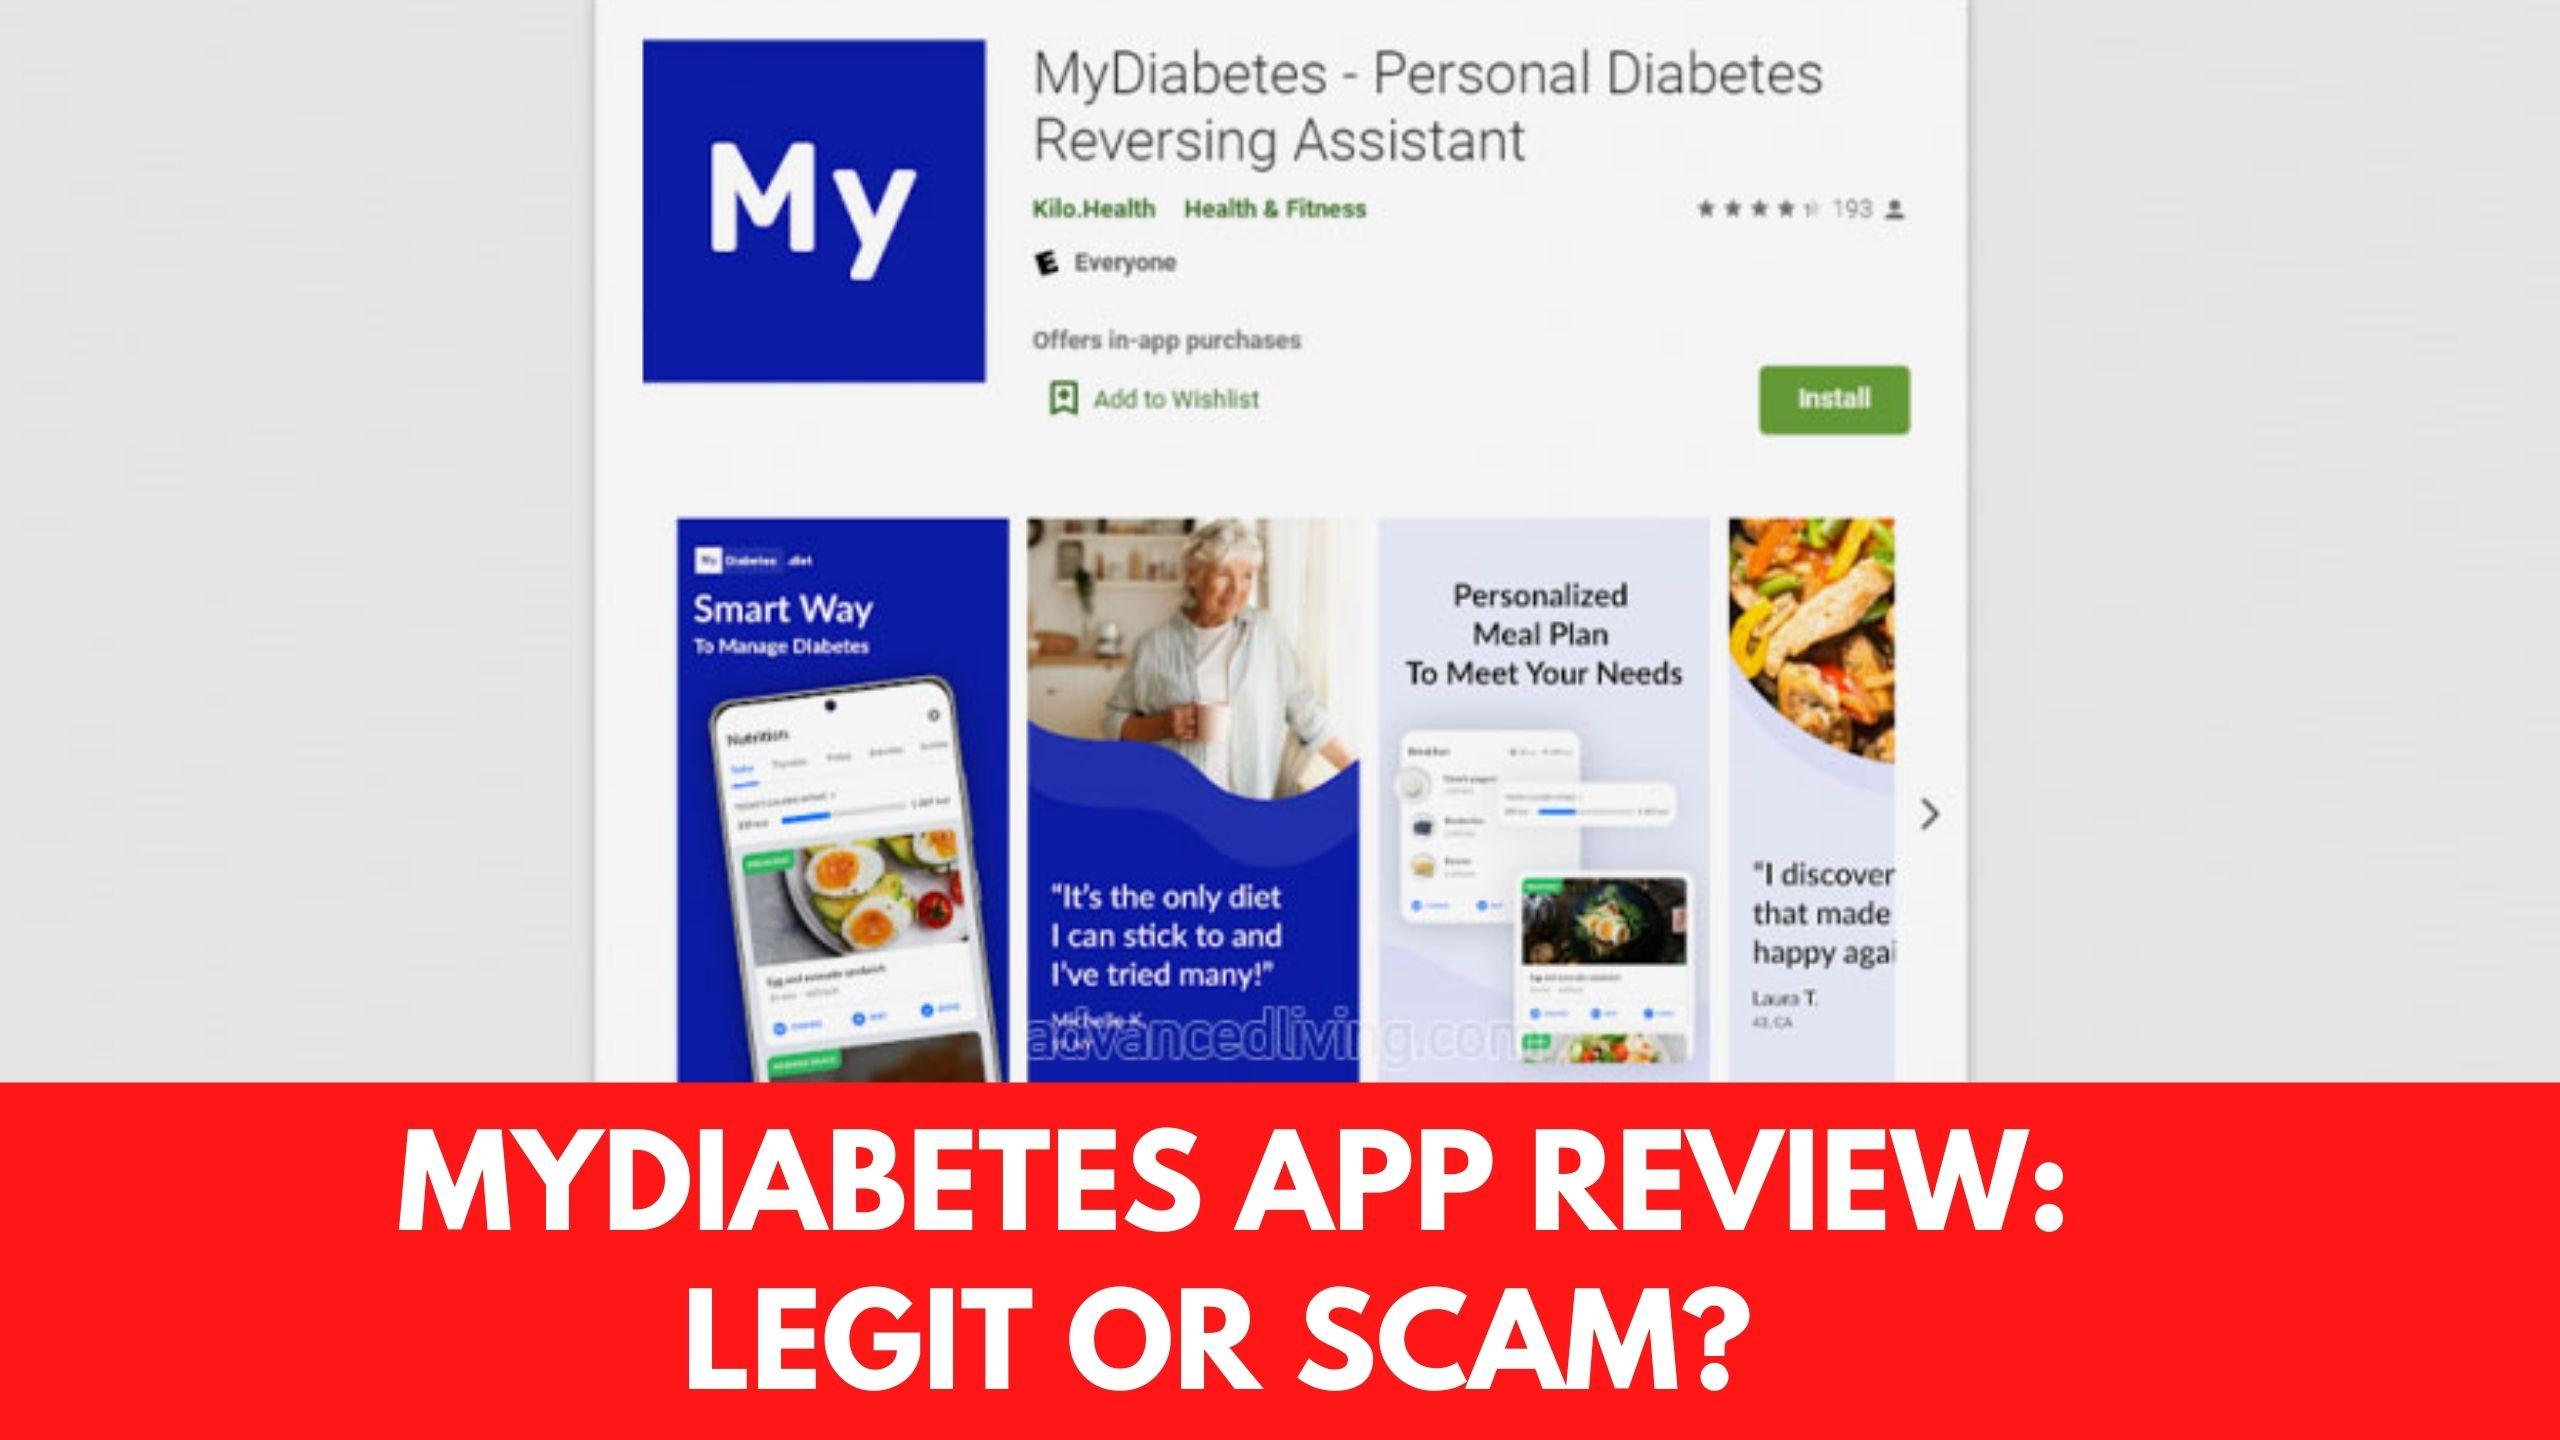 myDiabetes App Review